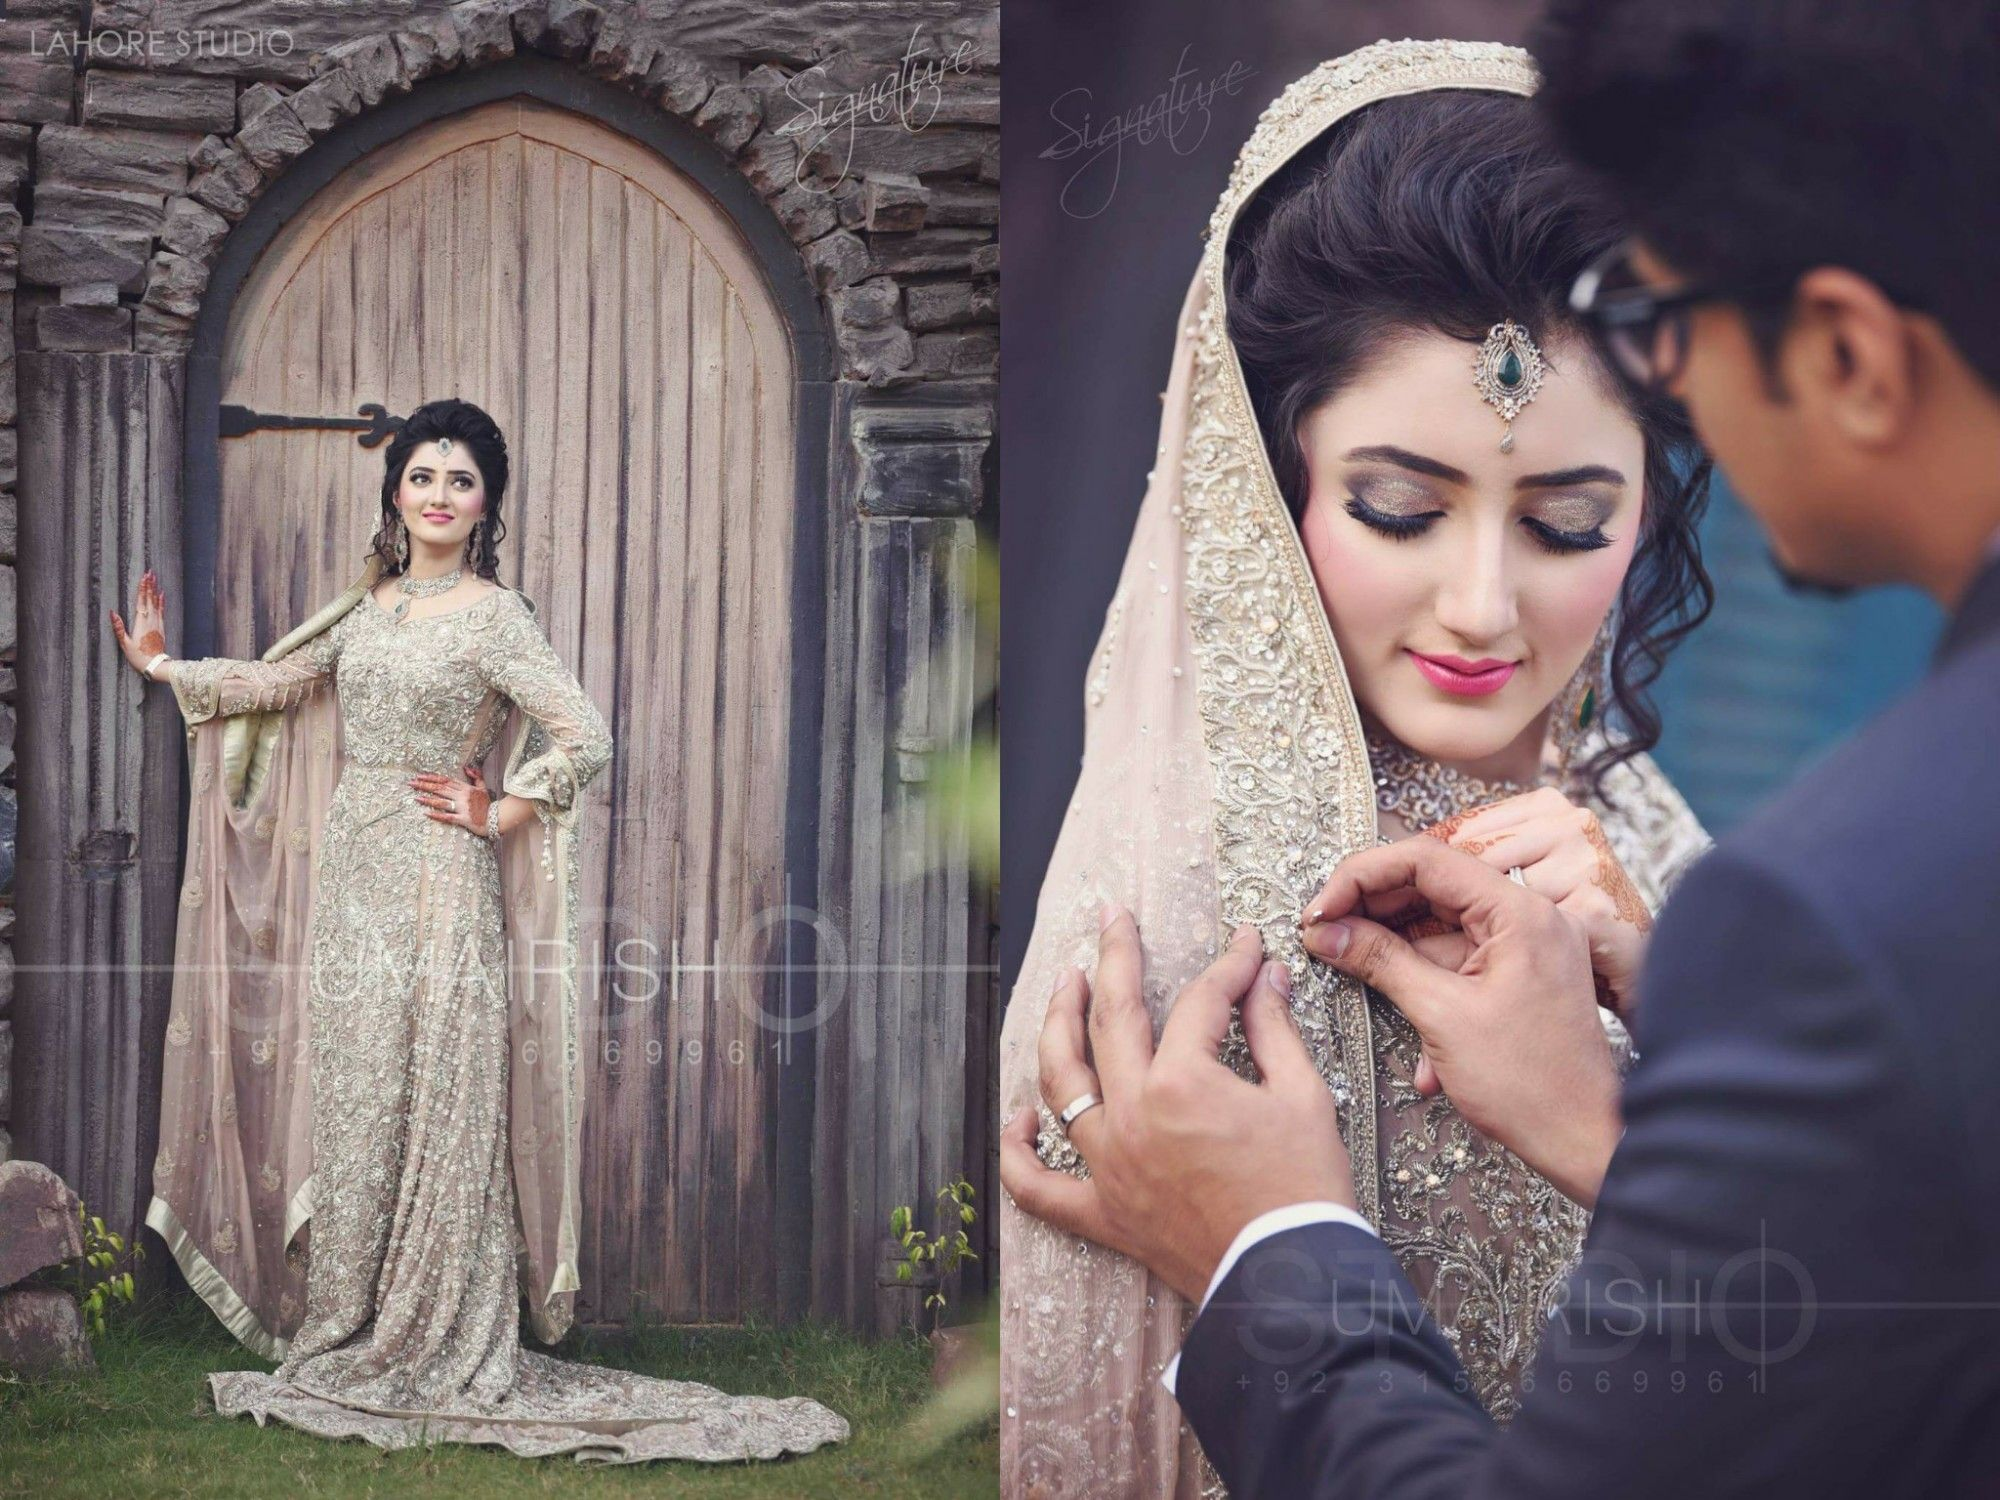 Stunning Bride And Her Beautiful Dress Will Long Tail Photography By Umairish Studio Pakistani Wedding Dresses Pakistani Bride Bridal Beauty